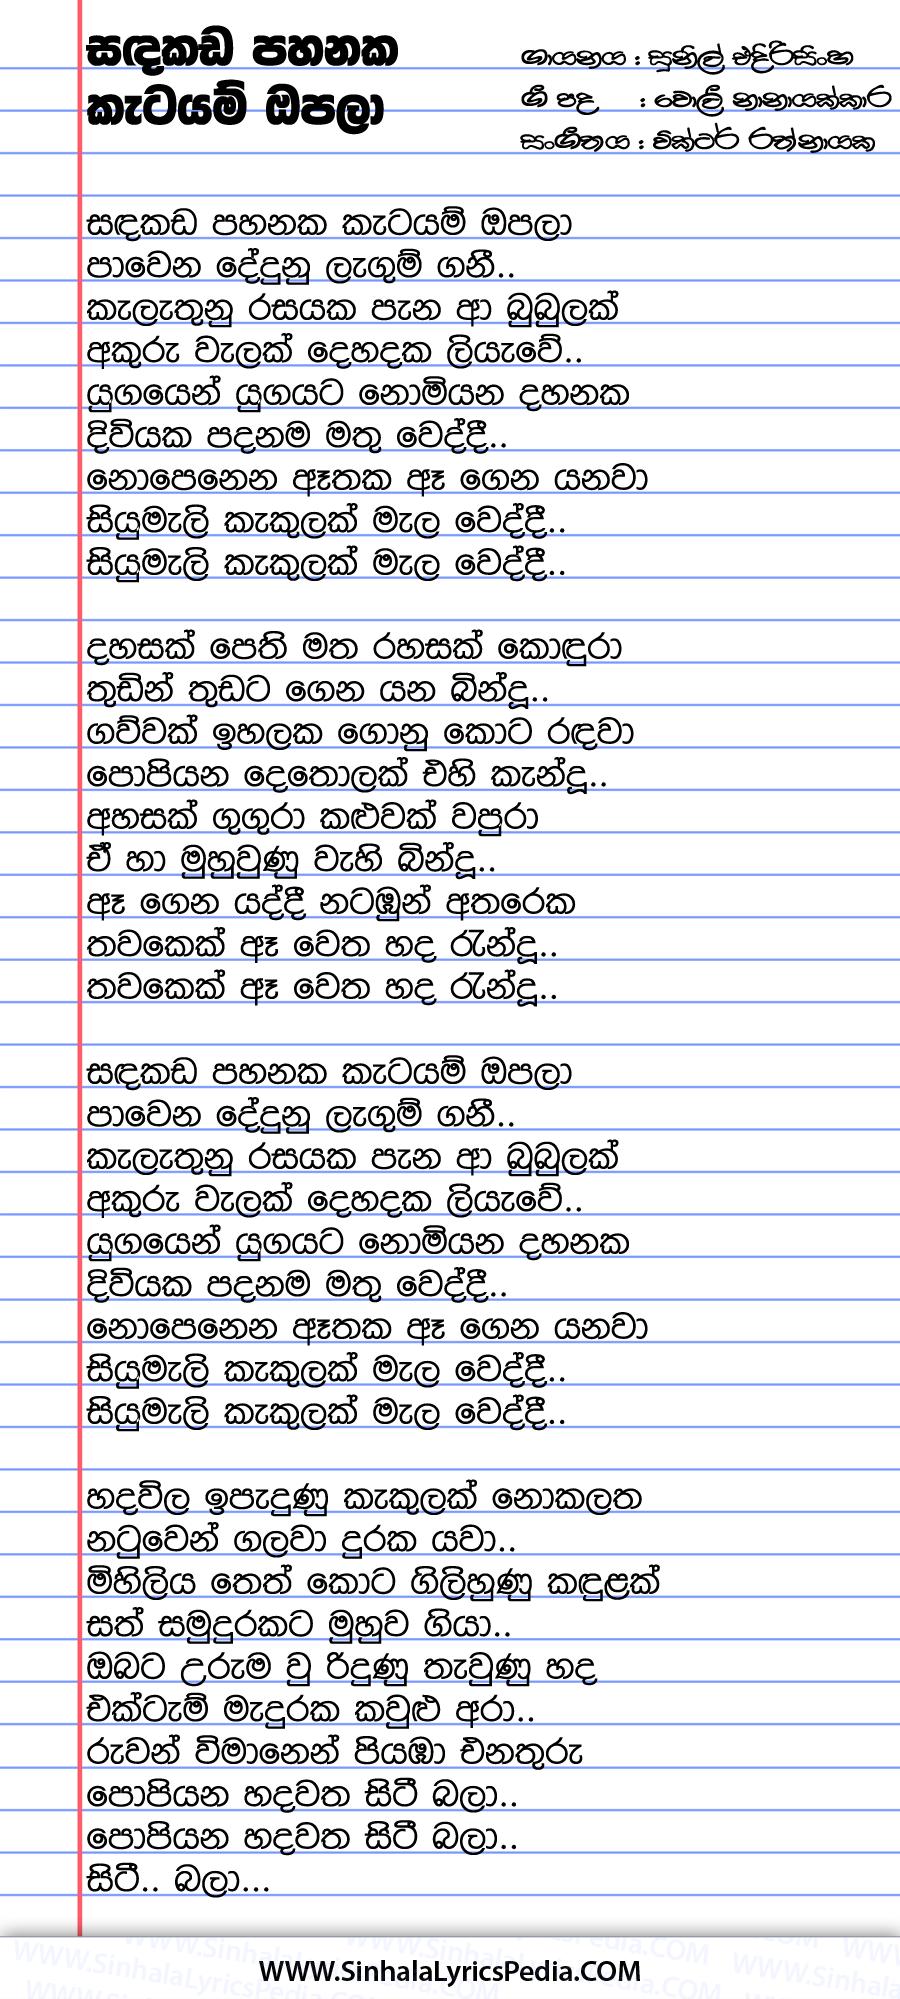 Sandakada Pahanaka Katayam Opala Song Lyrics